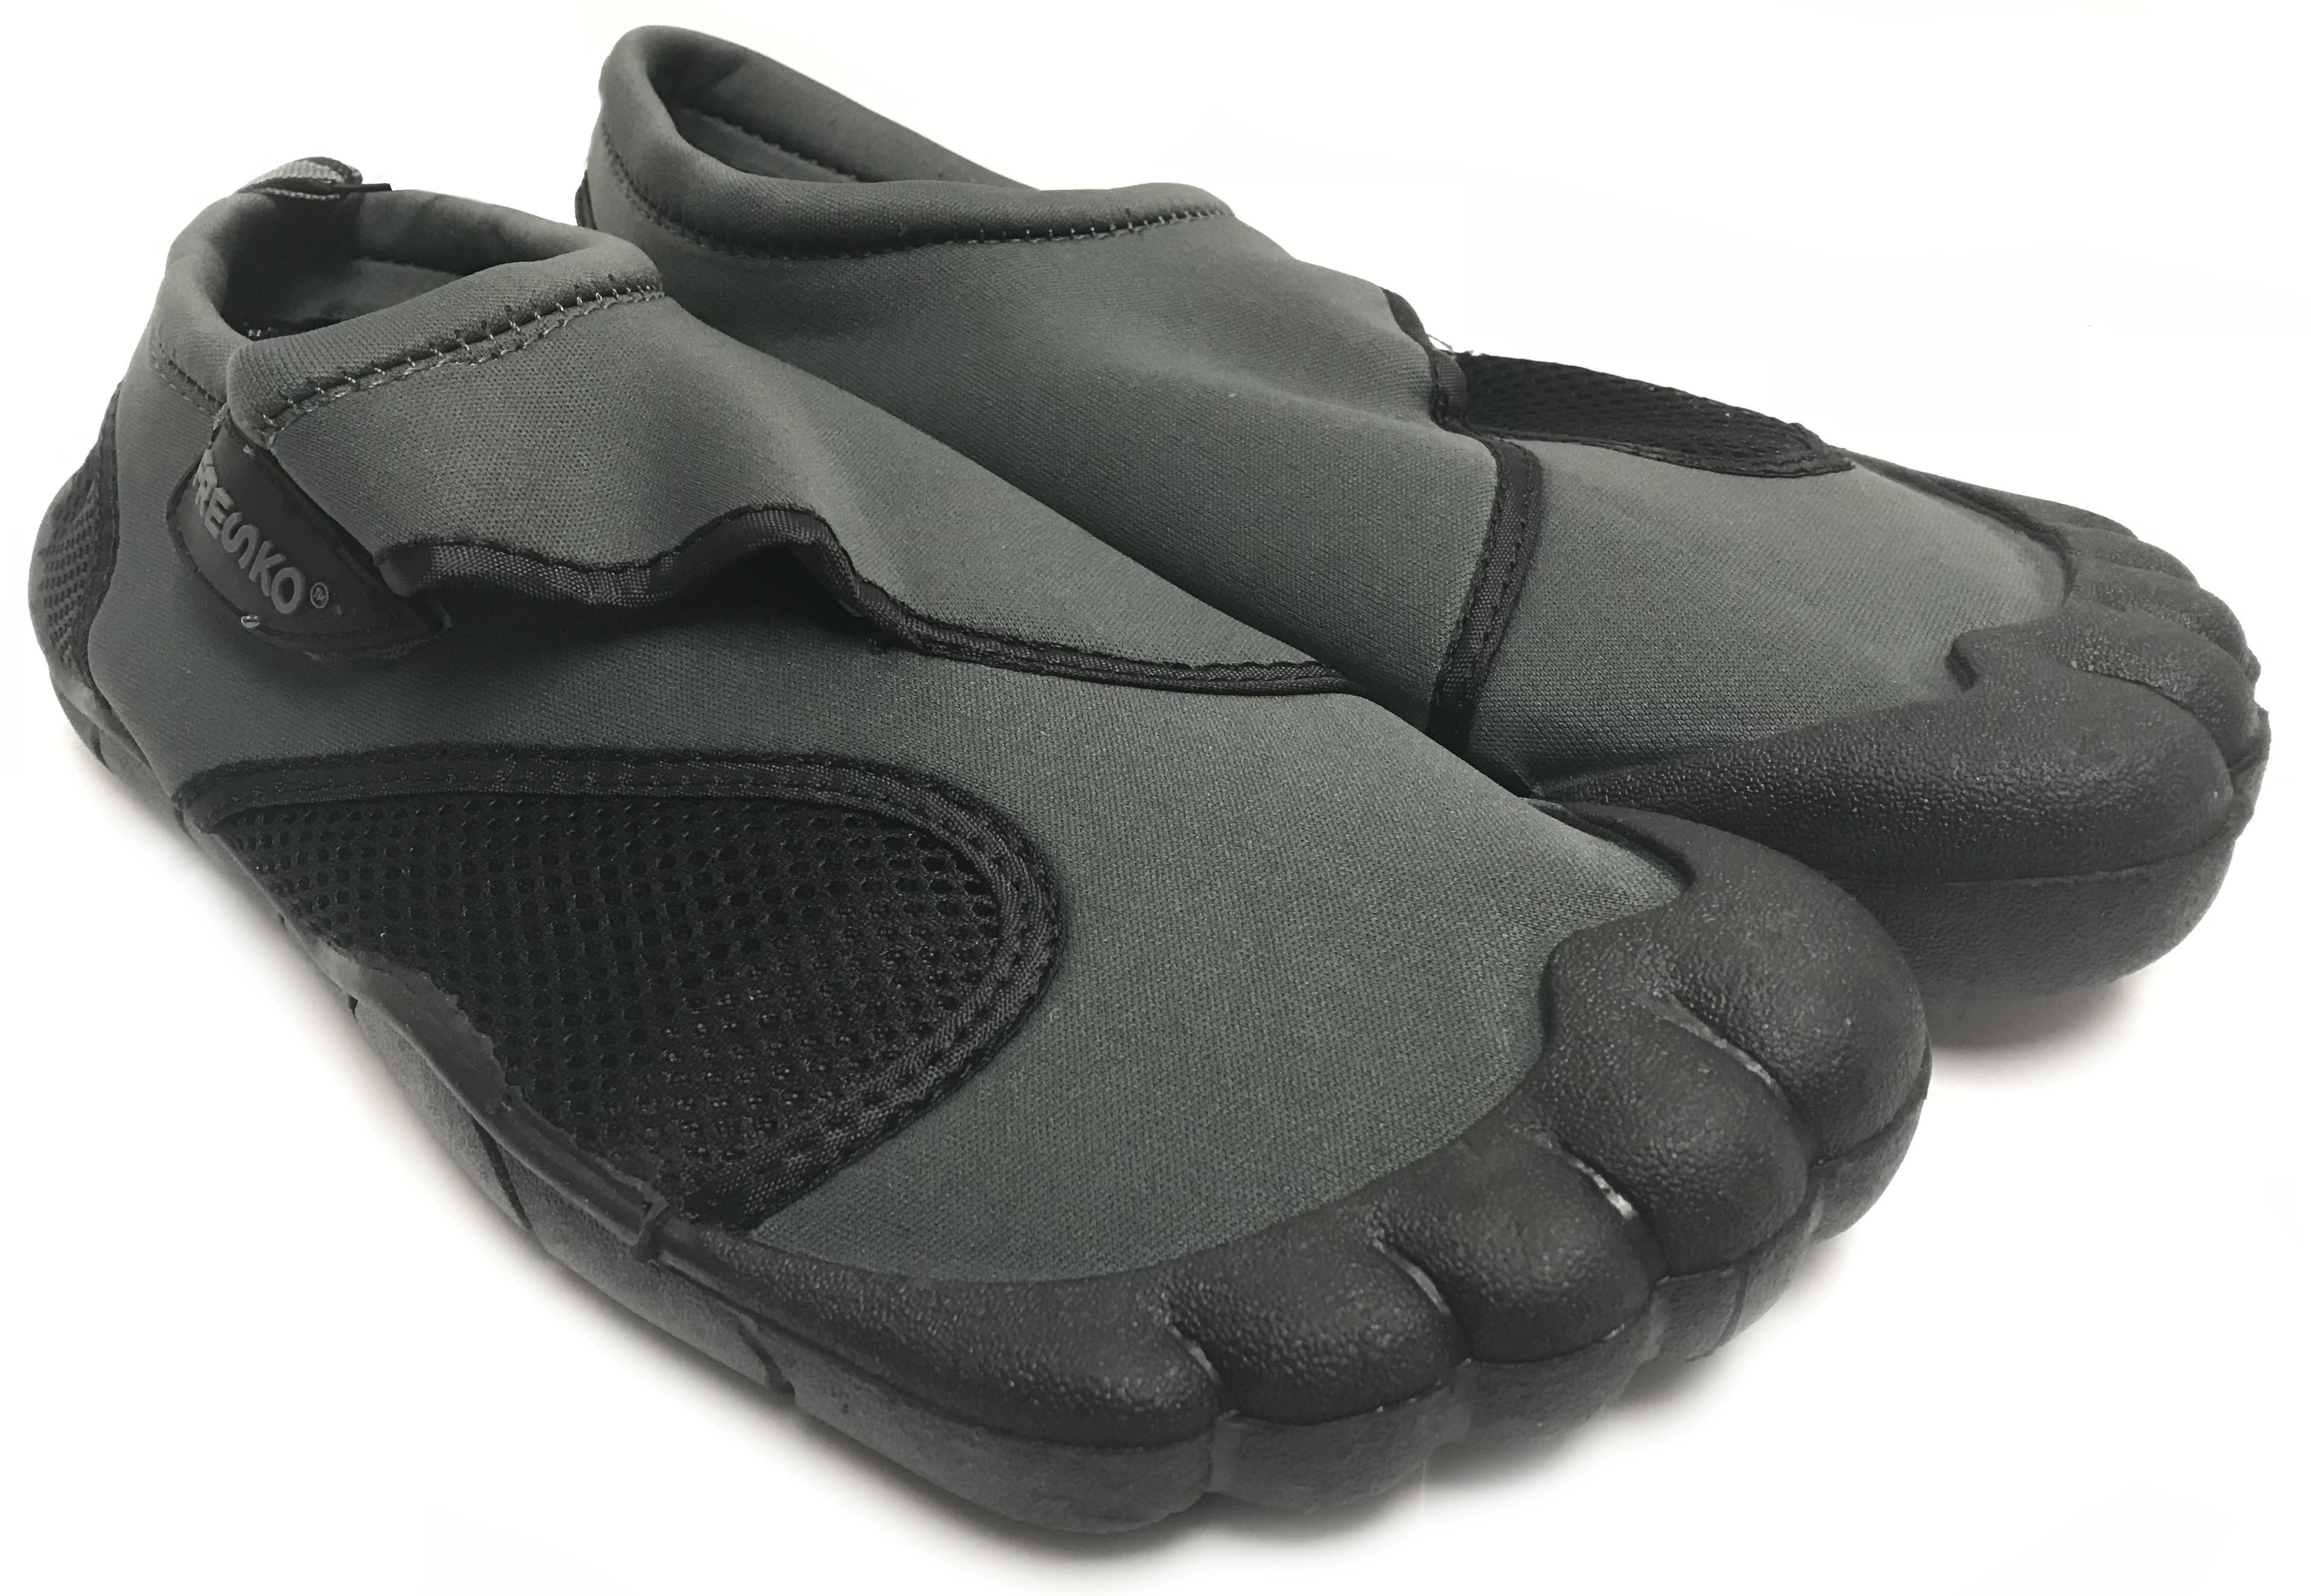 e3fbd7f0817d Fresko Men s Slip on Aqua Water Shoes with Toes